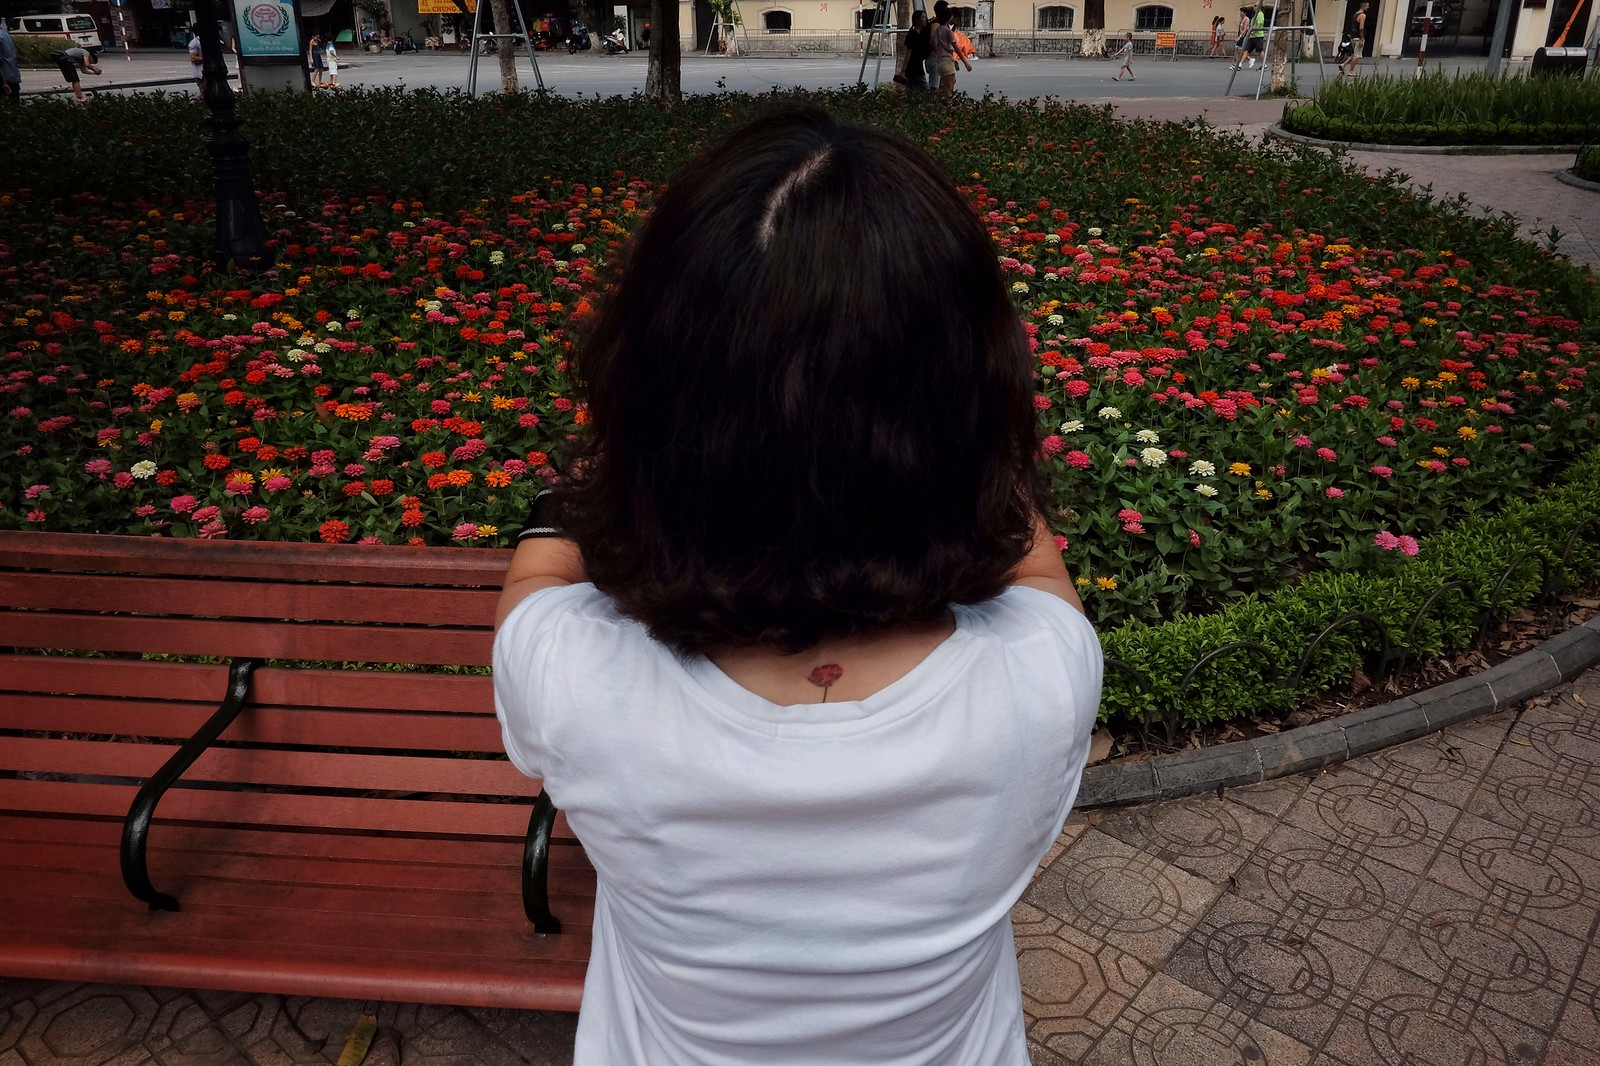 Flower | by chrjs.0510